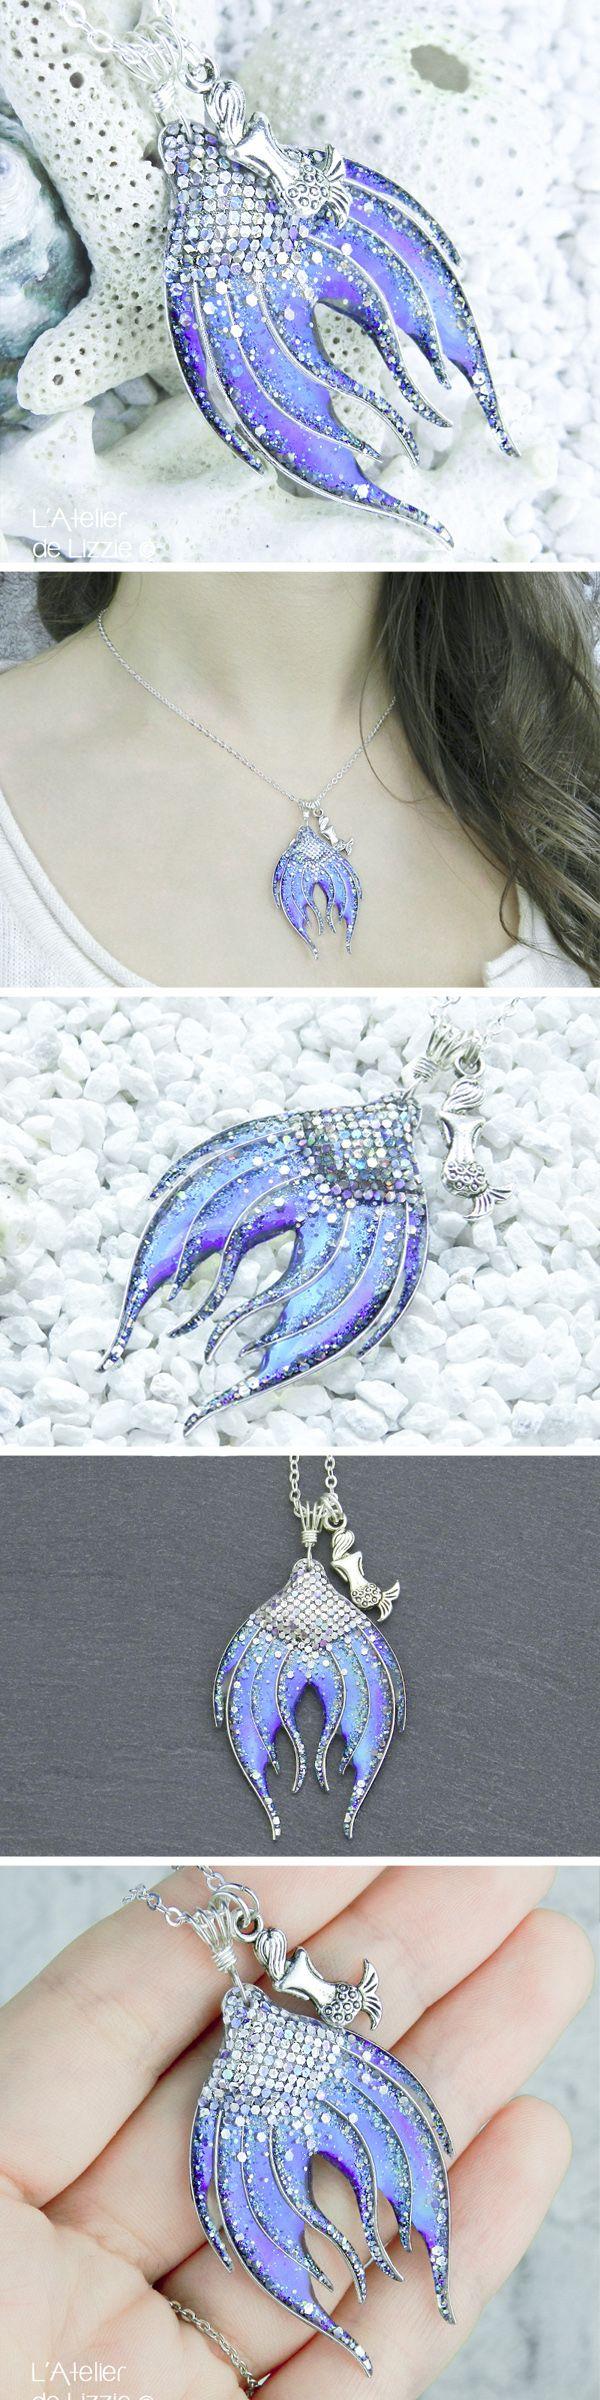 Mermaid Tail pendant Pendentif nageoire de sirène #1 Silver / peacock blue